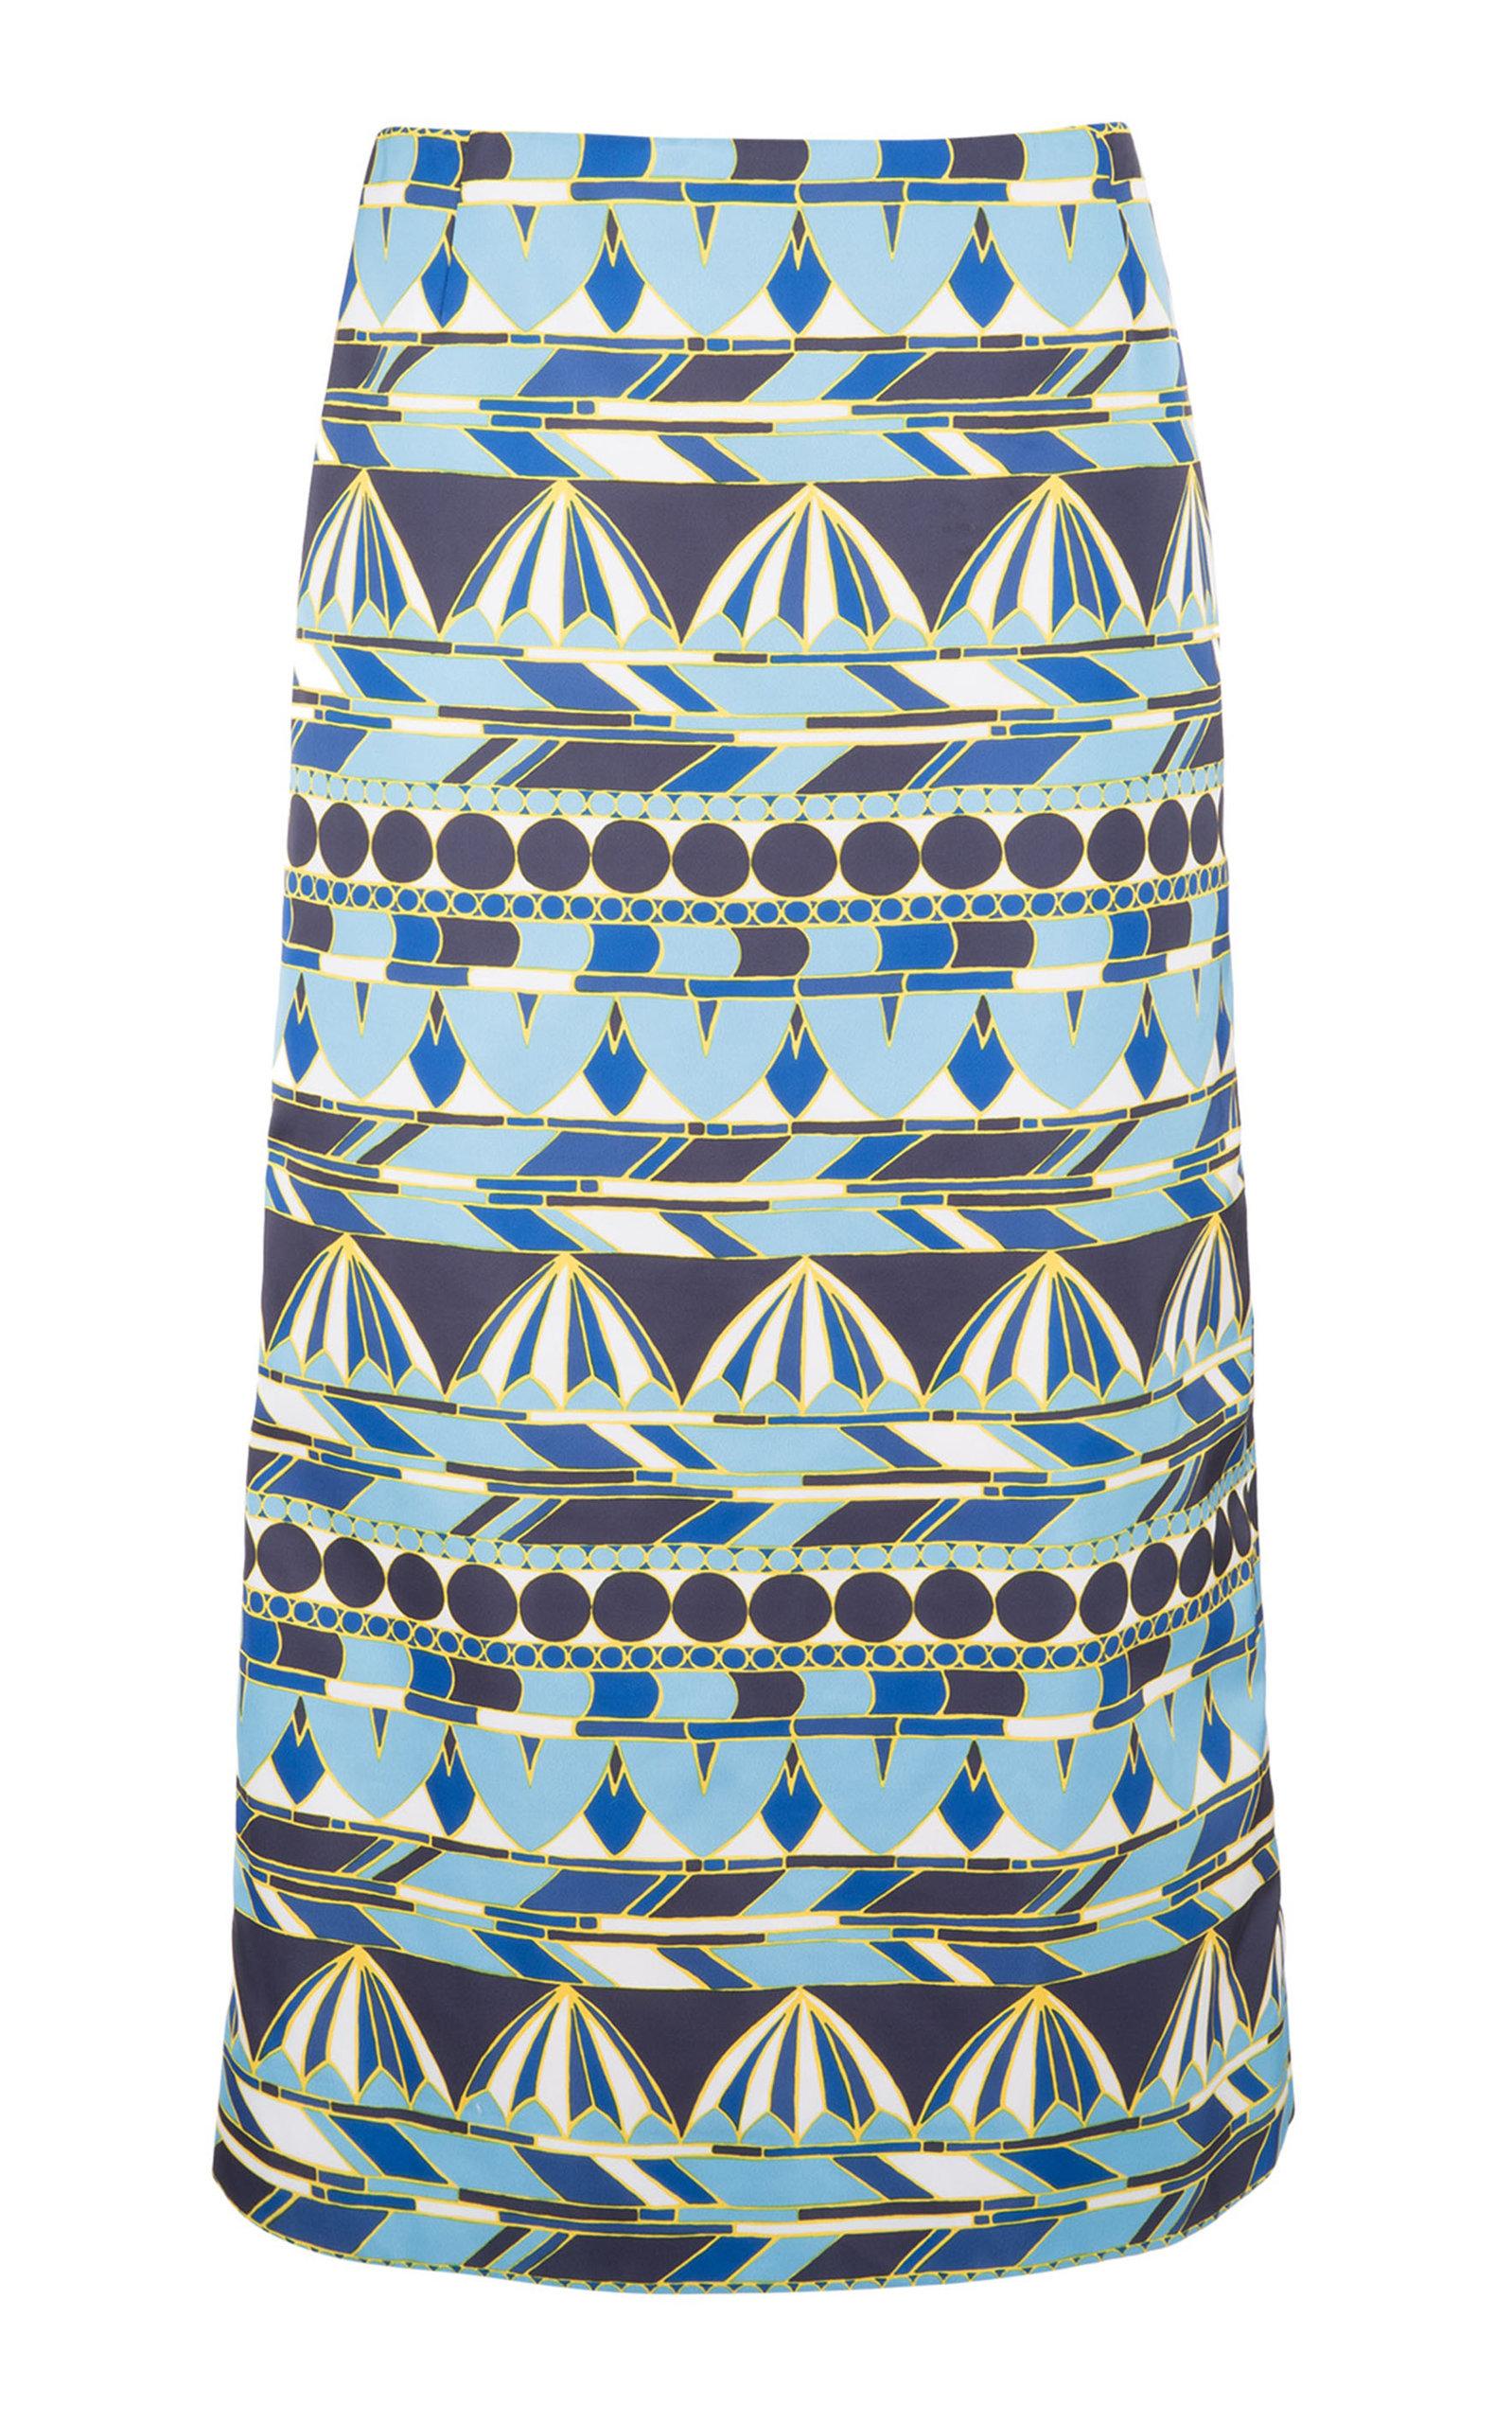 LA DOUBLEJ Umbrellas-Print Pencil Skirt in Blue